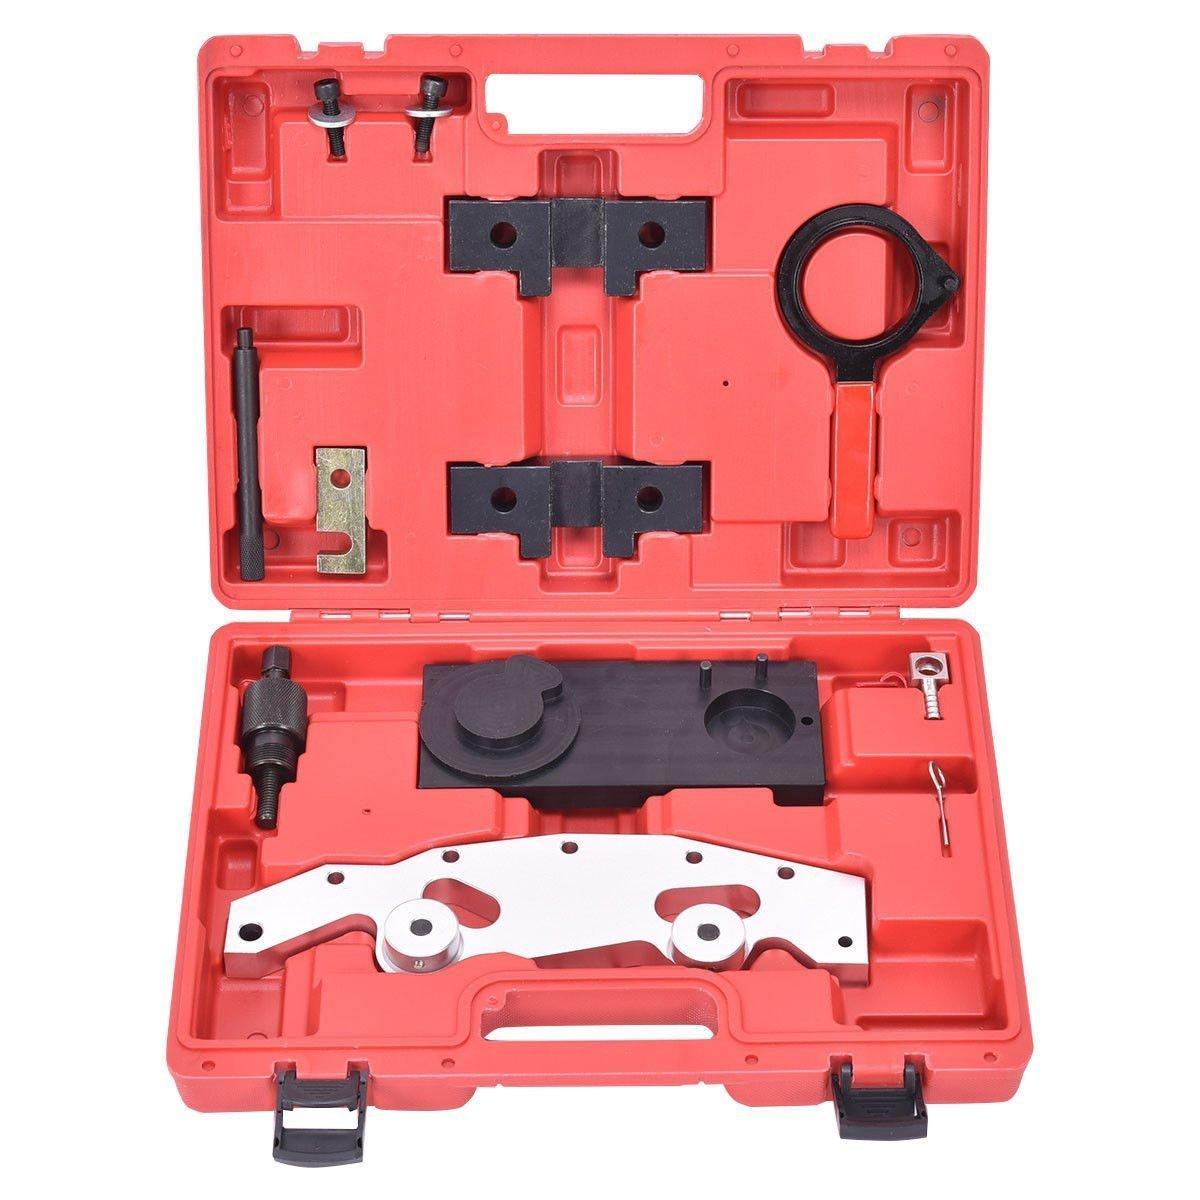 Goplus Camshaft Alignment Timing Tool Kit w/ Double Vanos For BMW M52TU M54 M56